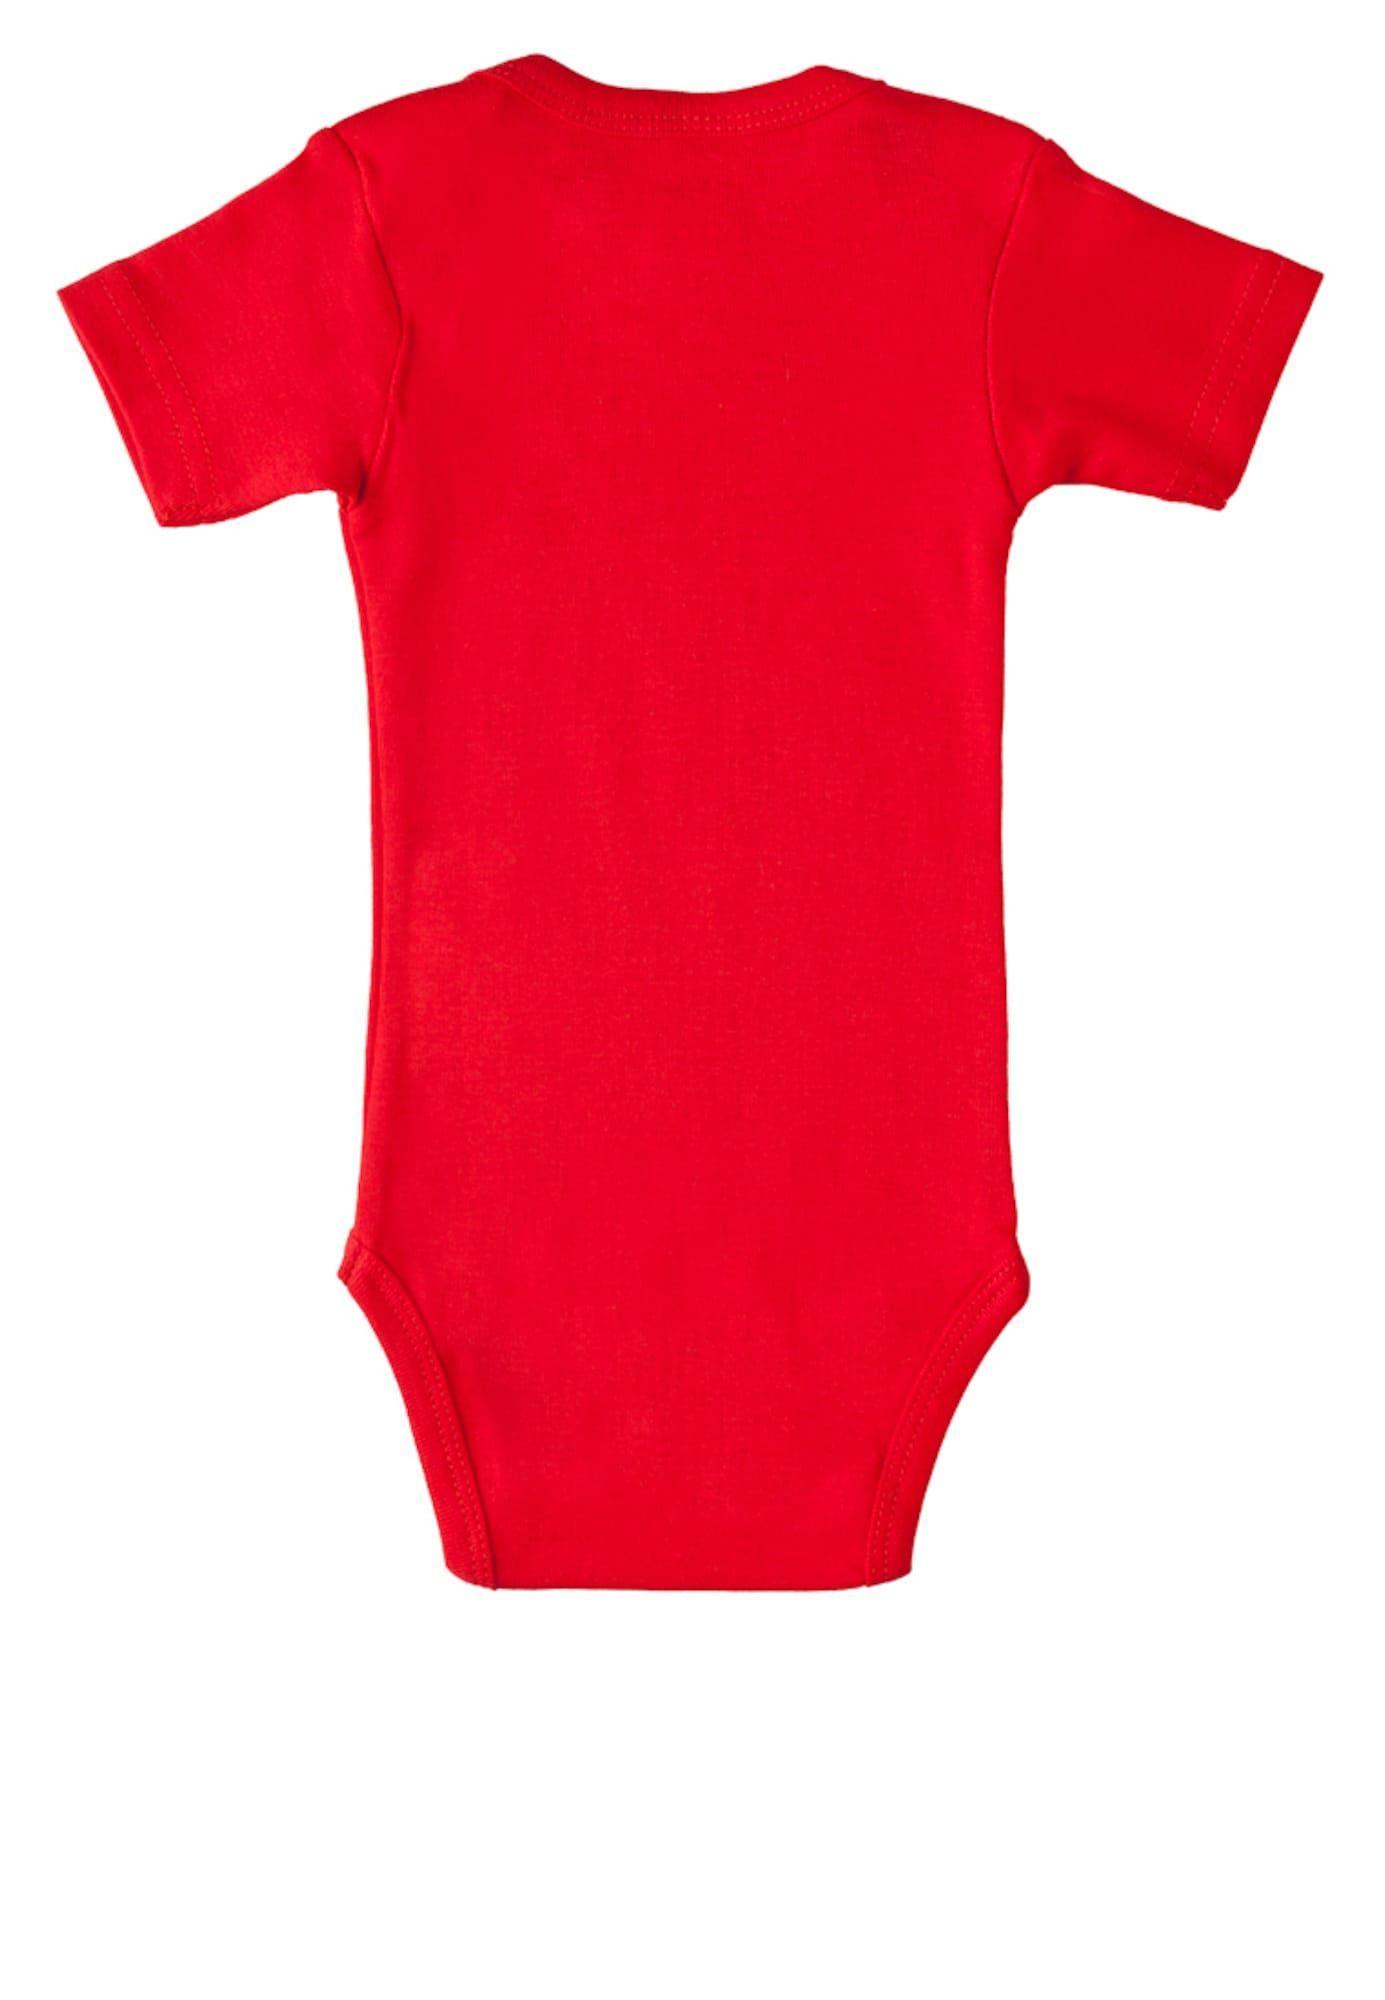 Logoshirt Baby Body Che Guevara Jungen Gelb Rot